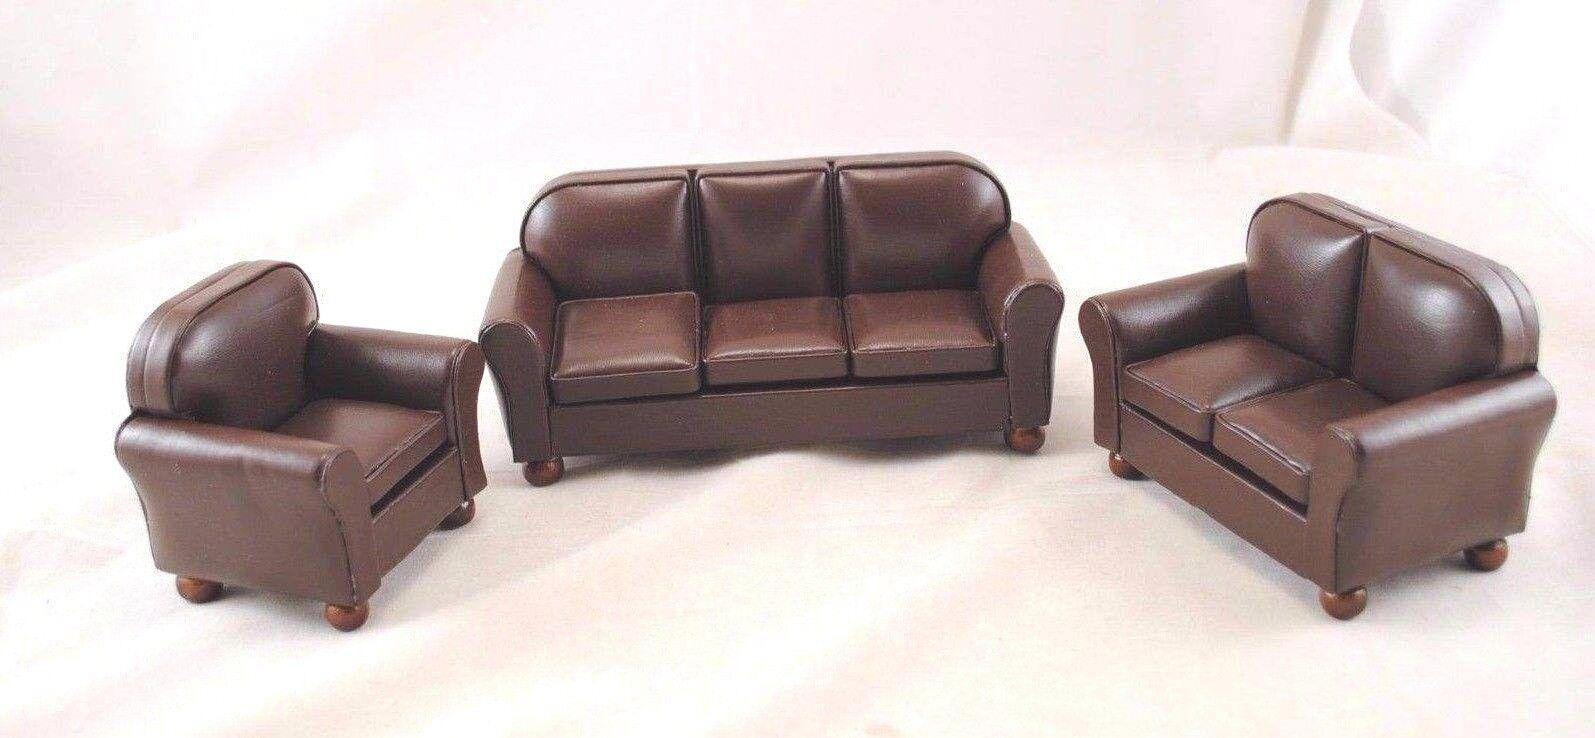 Living Room Set T6499 Braun Faux Leder Sofa miniature dollhouse 1-12 scale